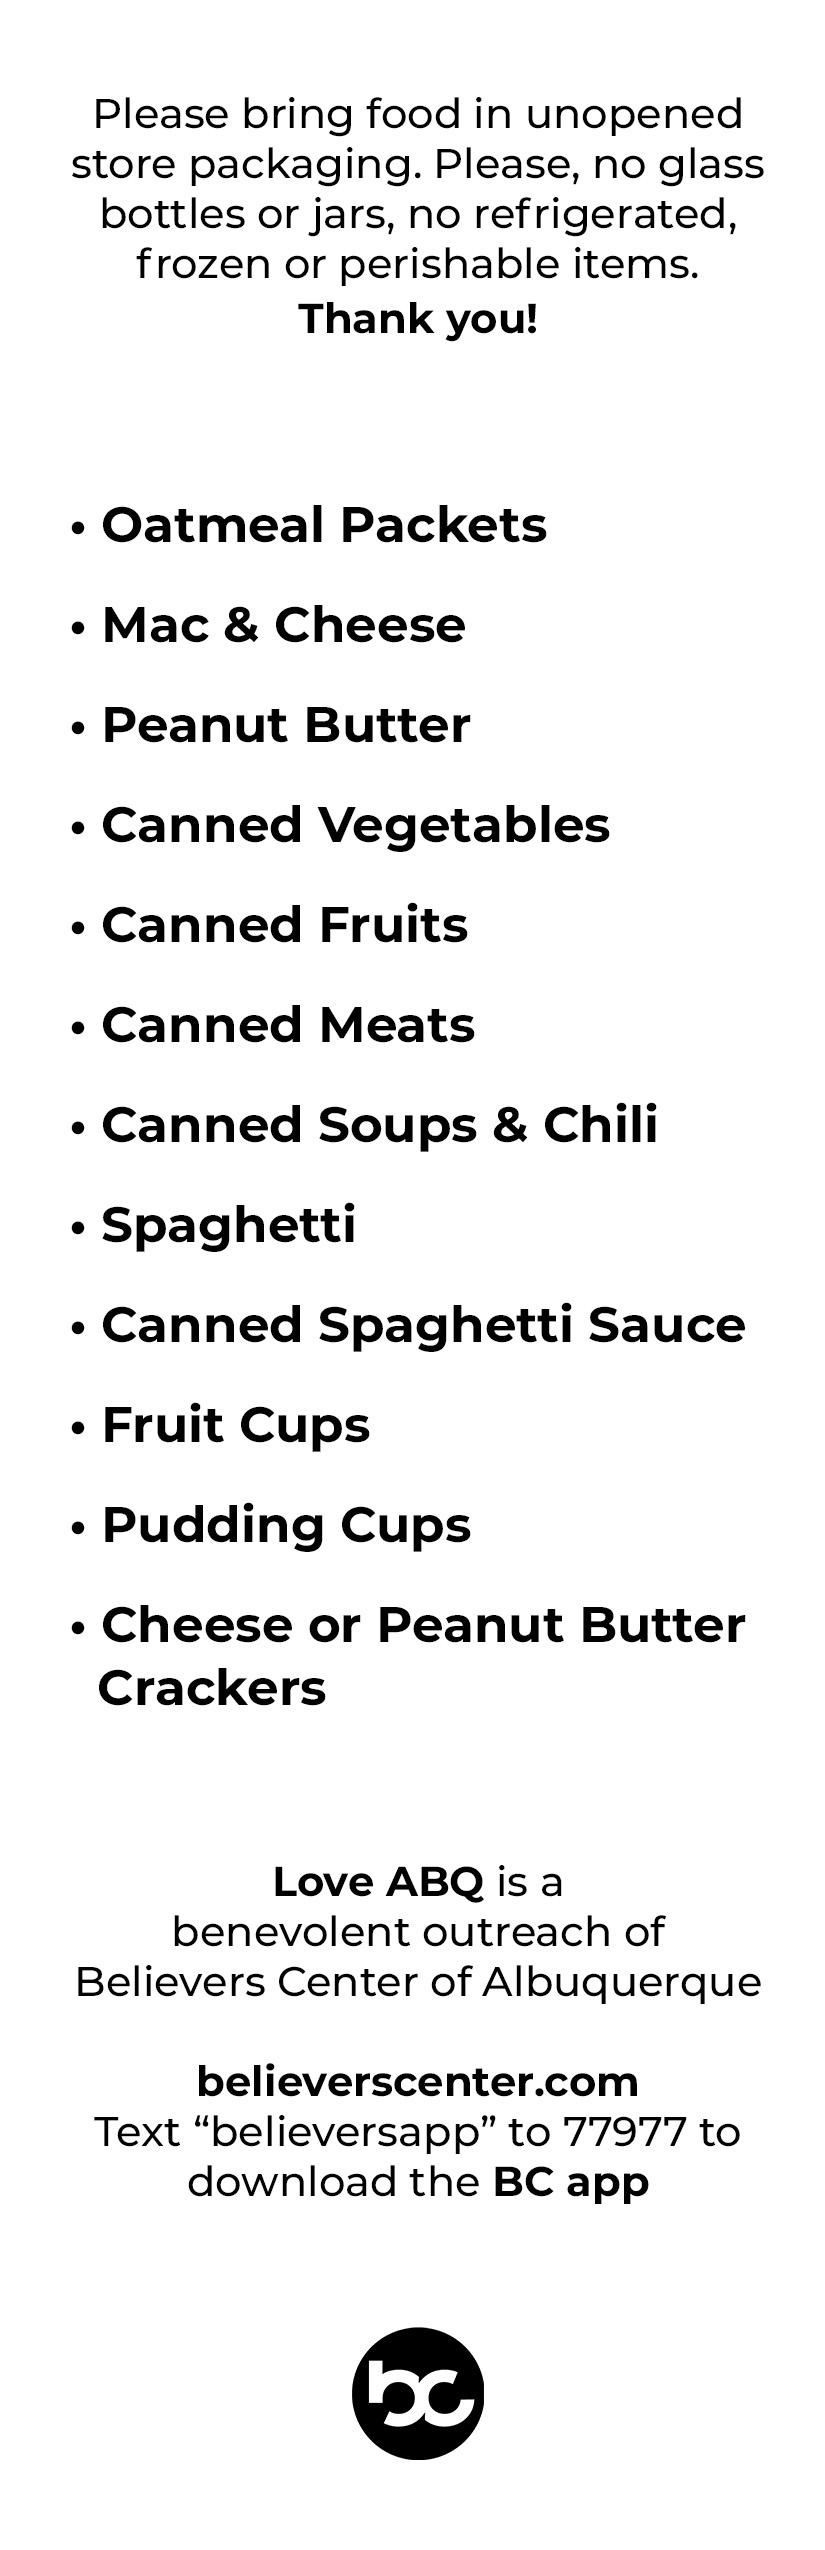 Love Abq food list_single_back.jpg